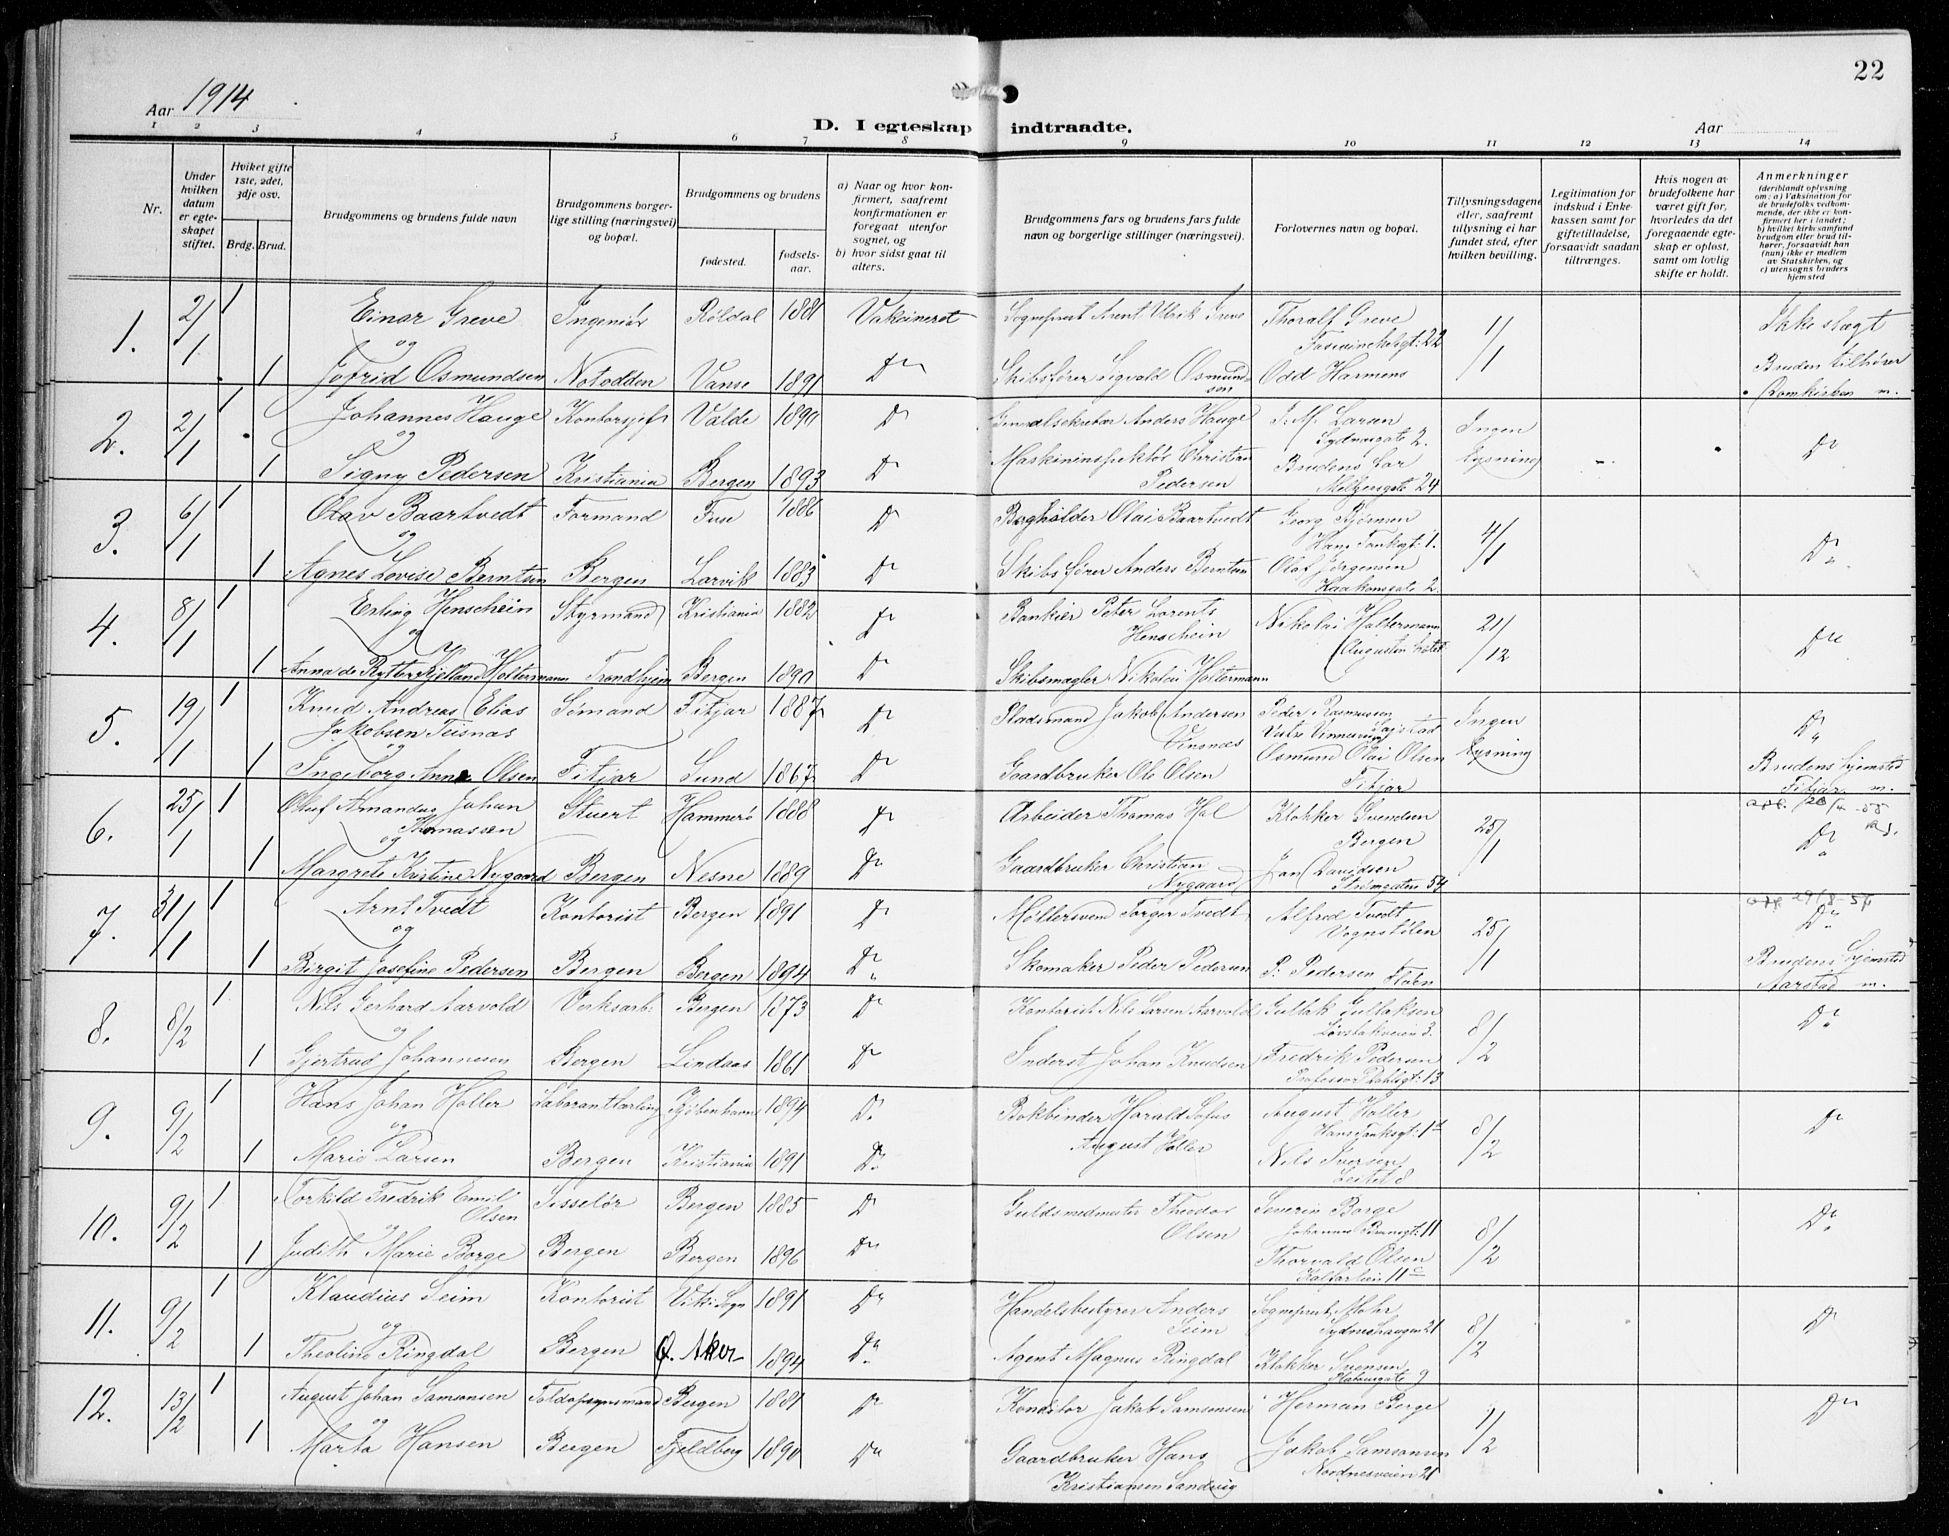 SAB, Johanneskirken Sokneprestembete, H/Haa/L0013: Ministerialbok nr. D 2, 1912-1929, s. 22